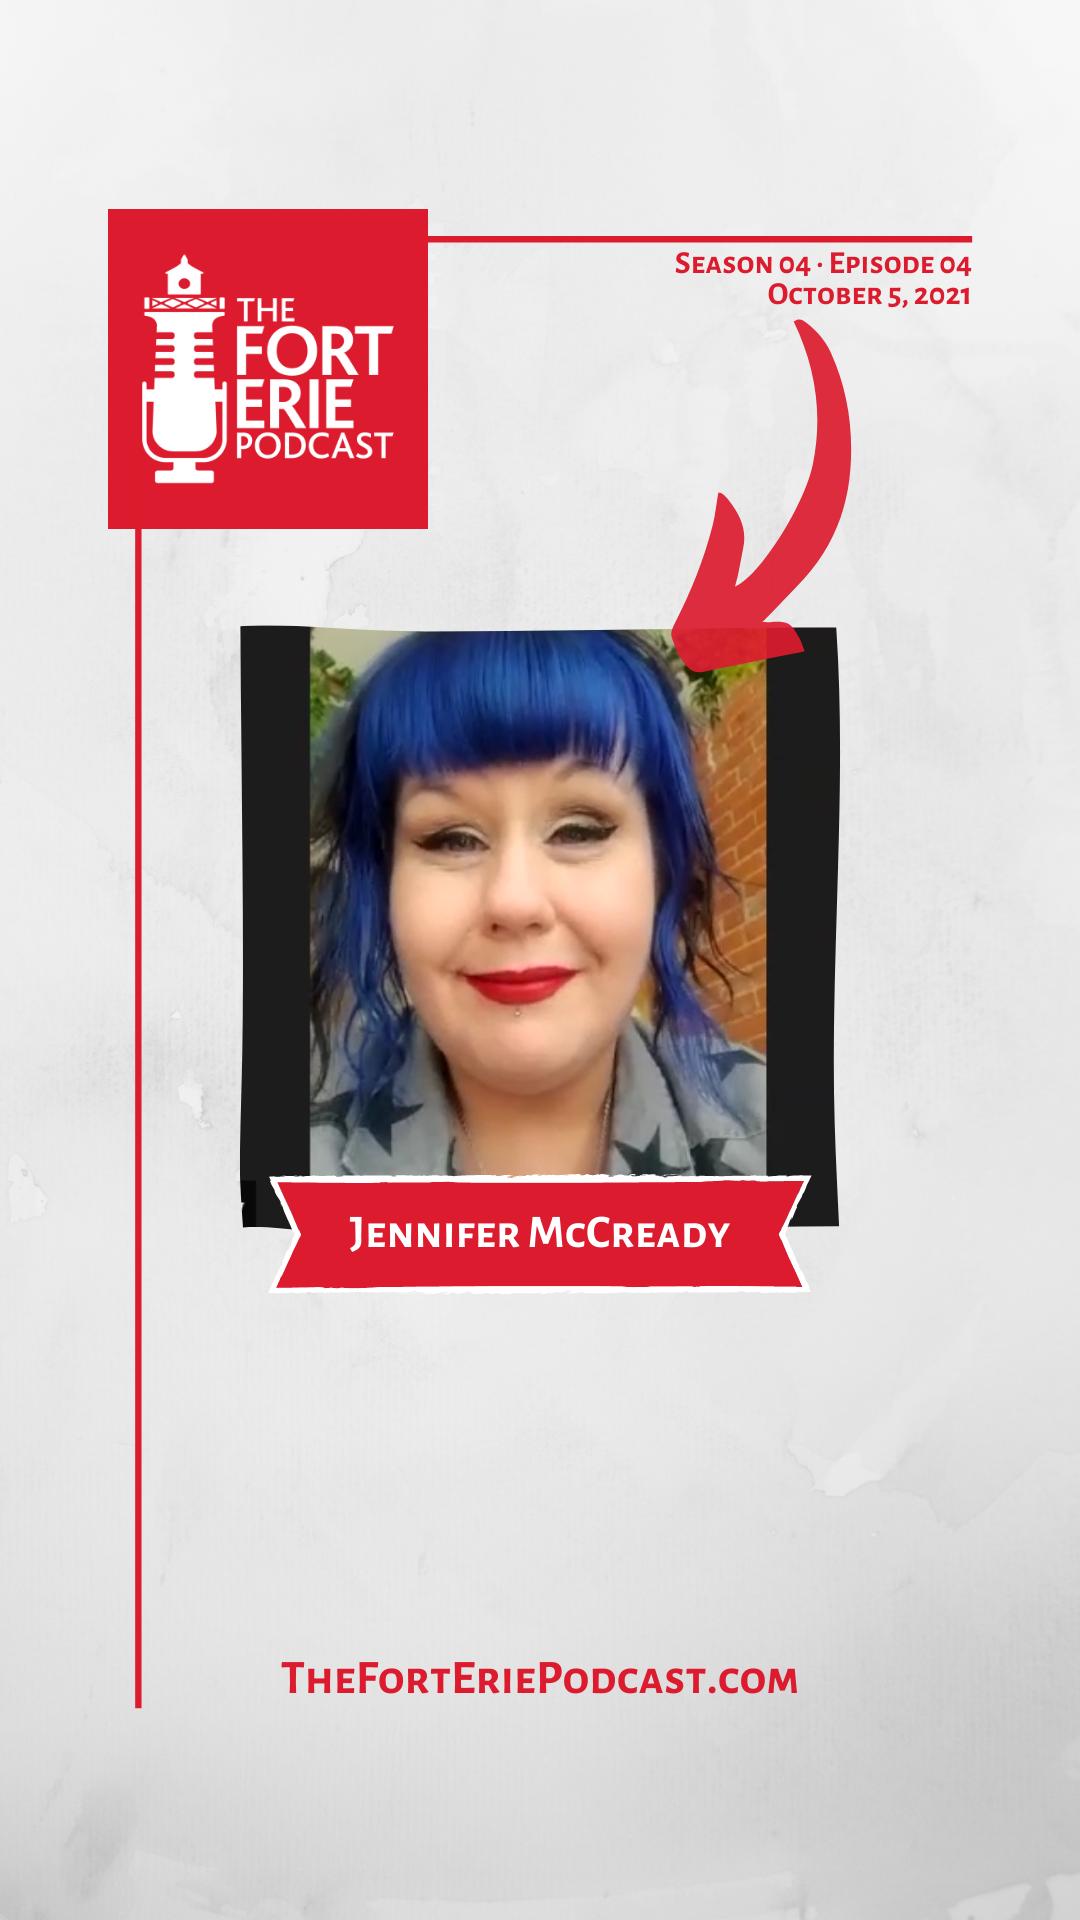 S04E04 – Jennifer McCready, Lady Luck Photography Studio